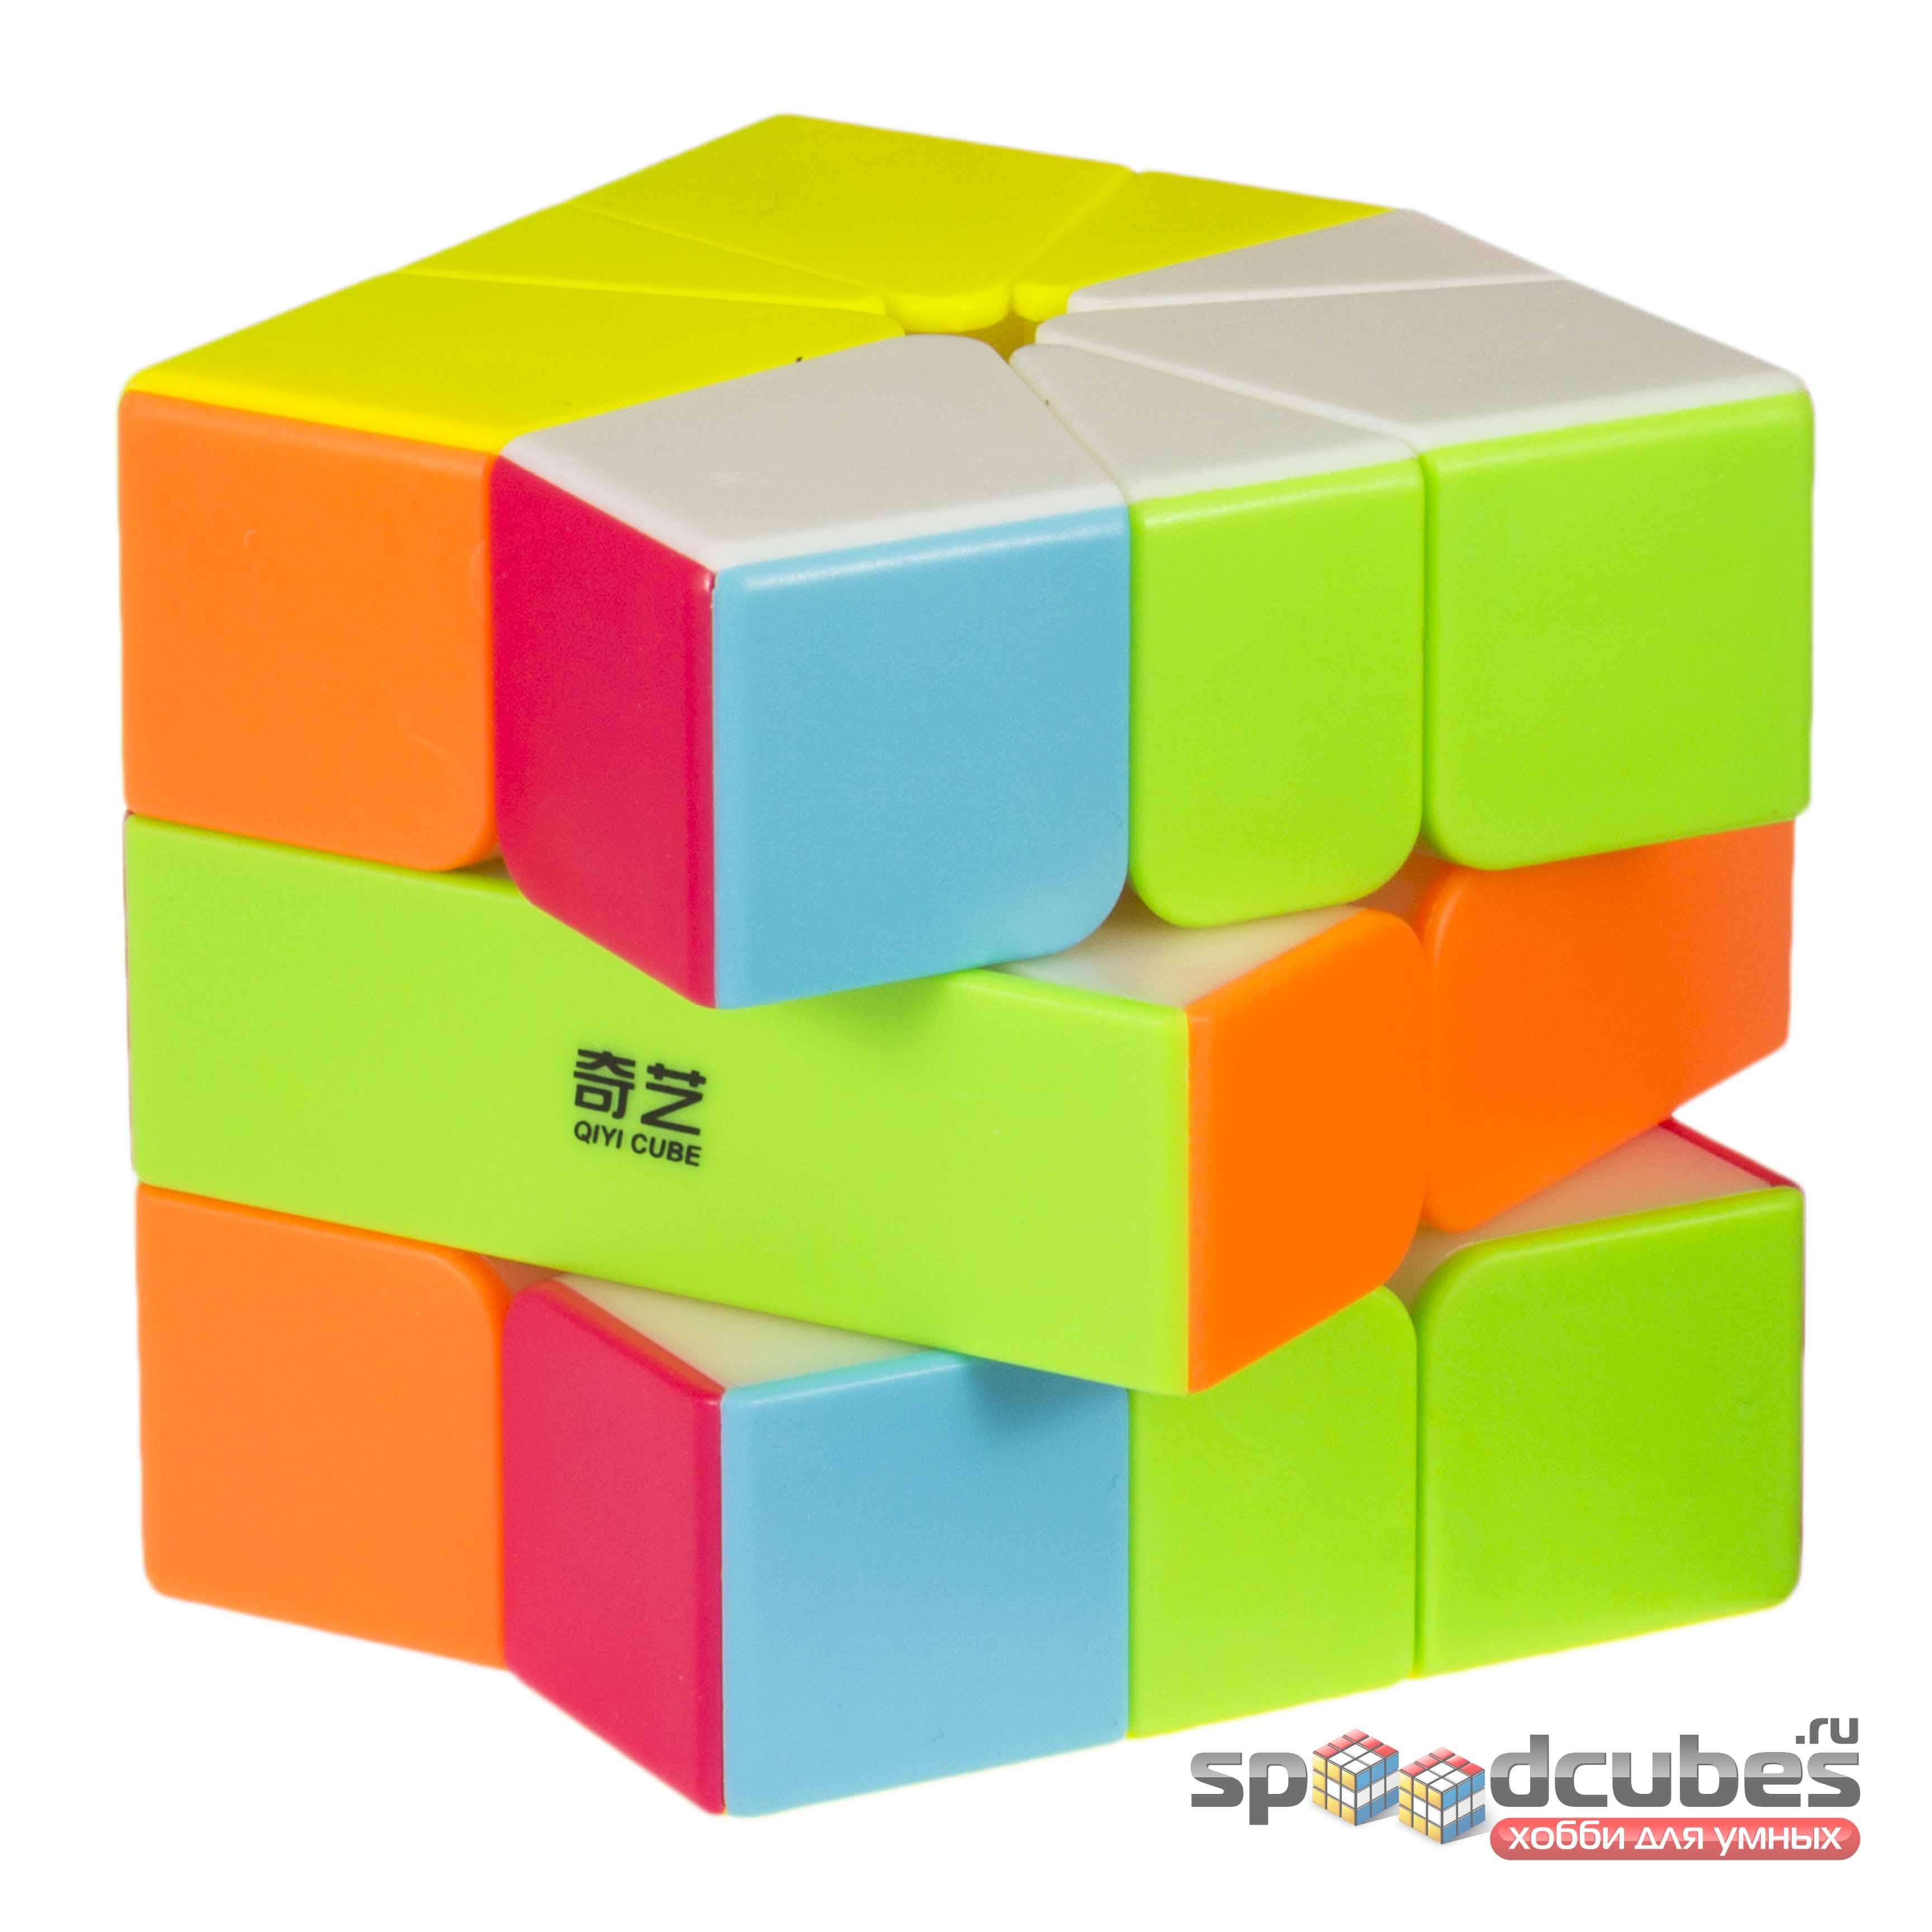 QiYi (MoFangGe) QiFa Square 1 Color 3